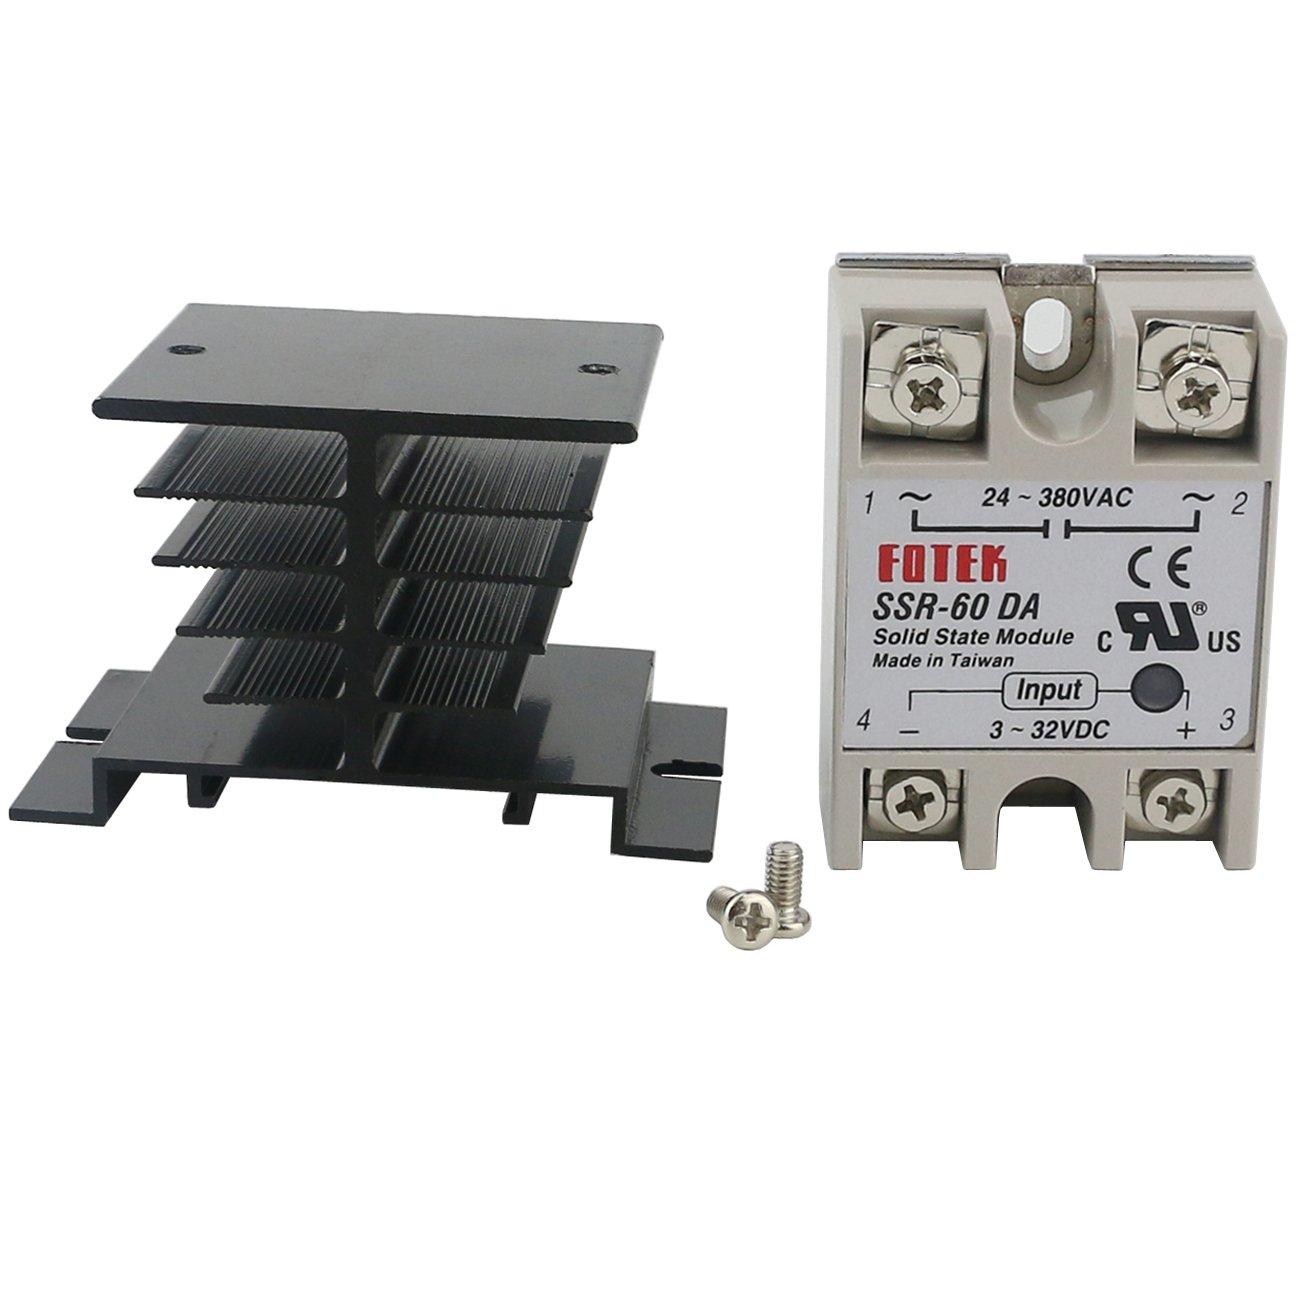 Sunnyglade Solid State Relay SSR-60DA with Heat Sink Input 3-32VDC Output 24V-380VAC (SSR-60 DA)